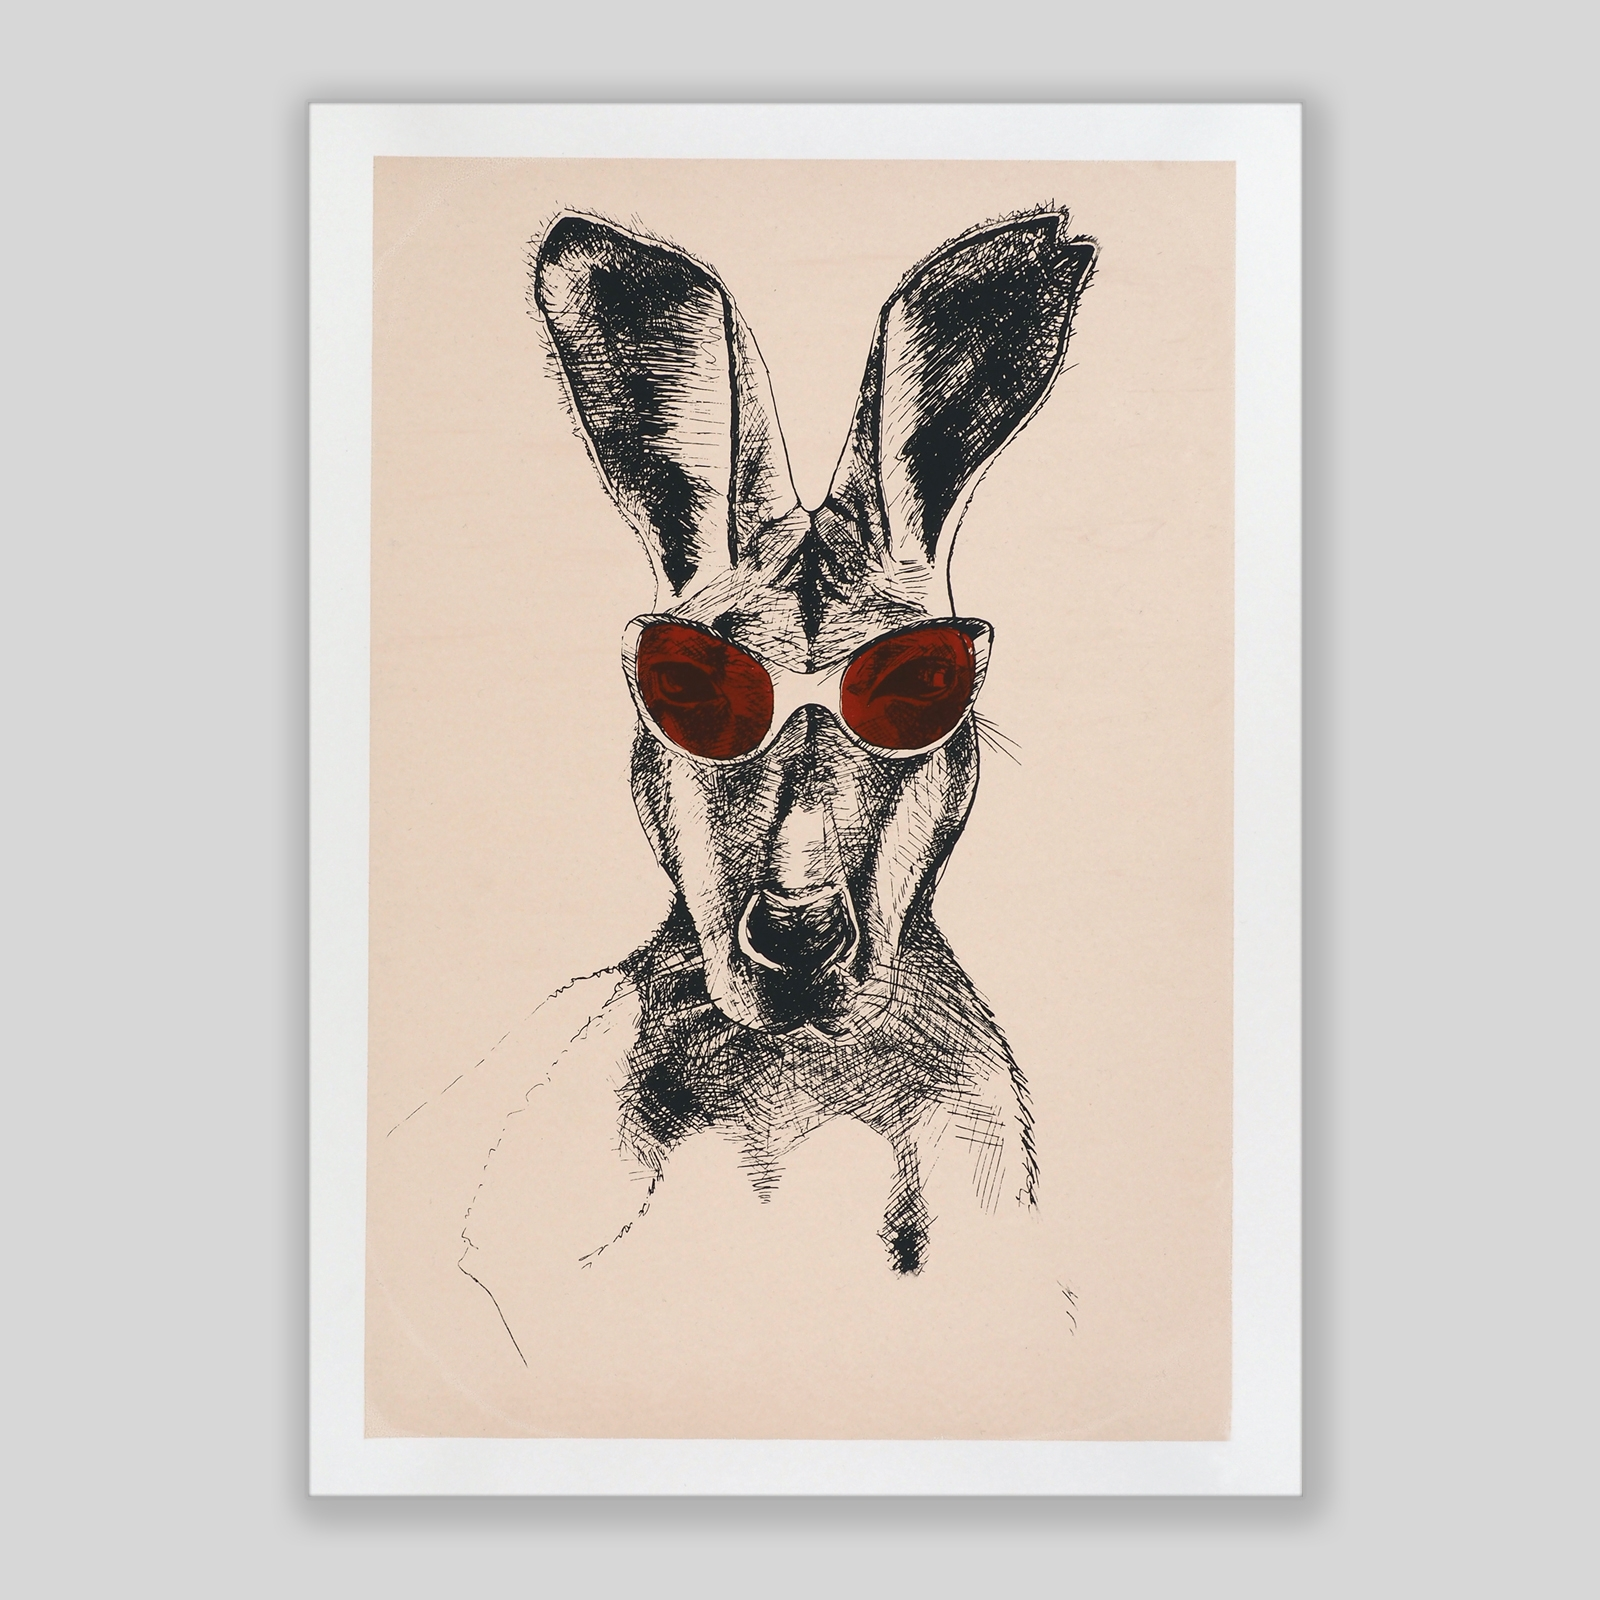 Känguru mit bordeaux-roter Brille